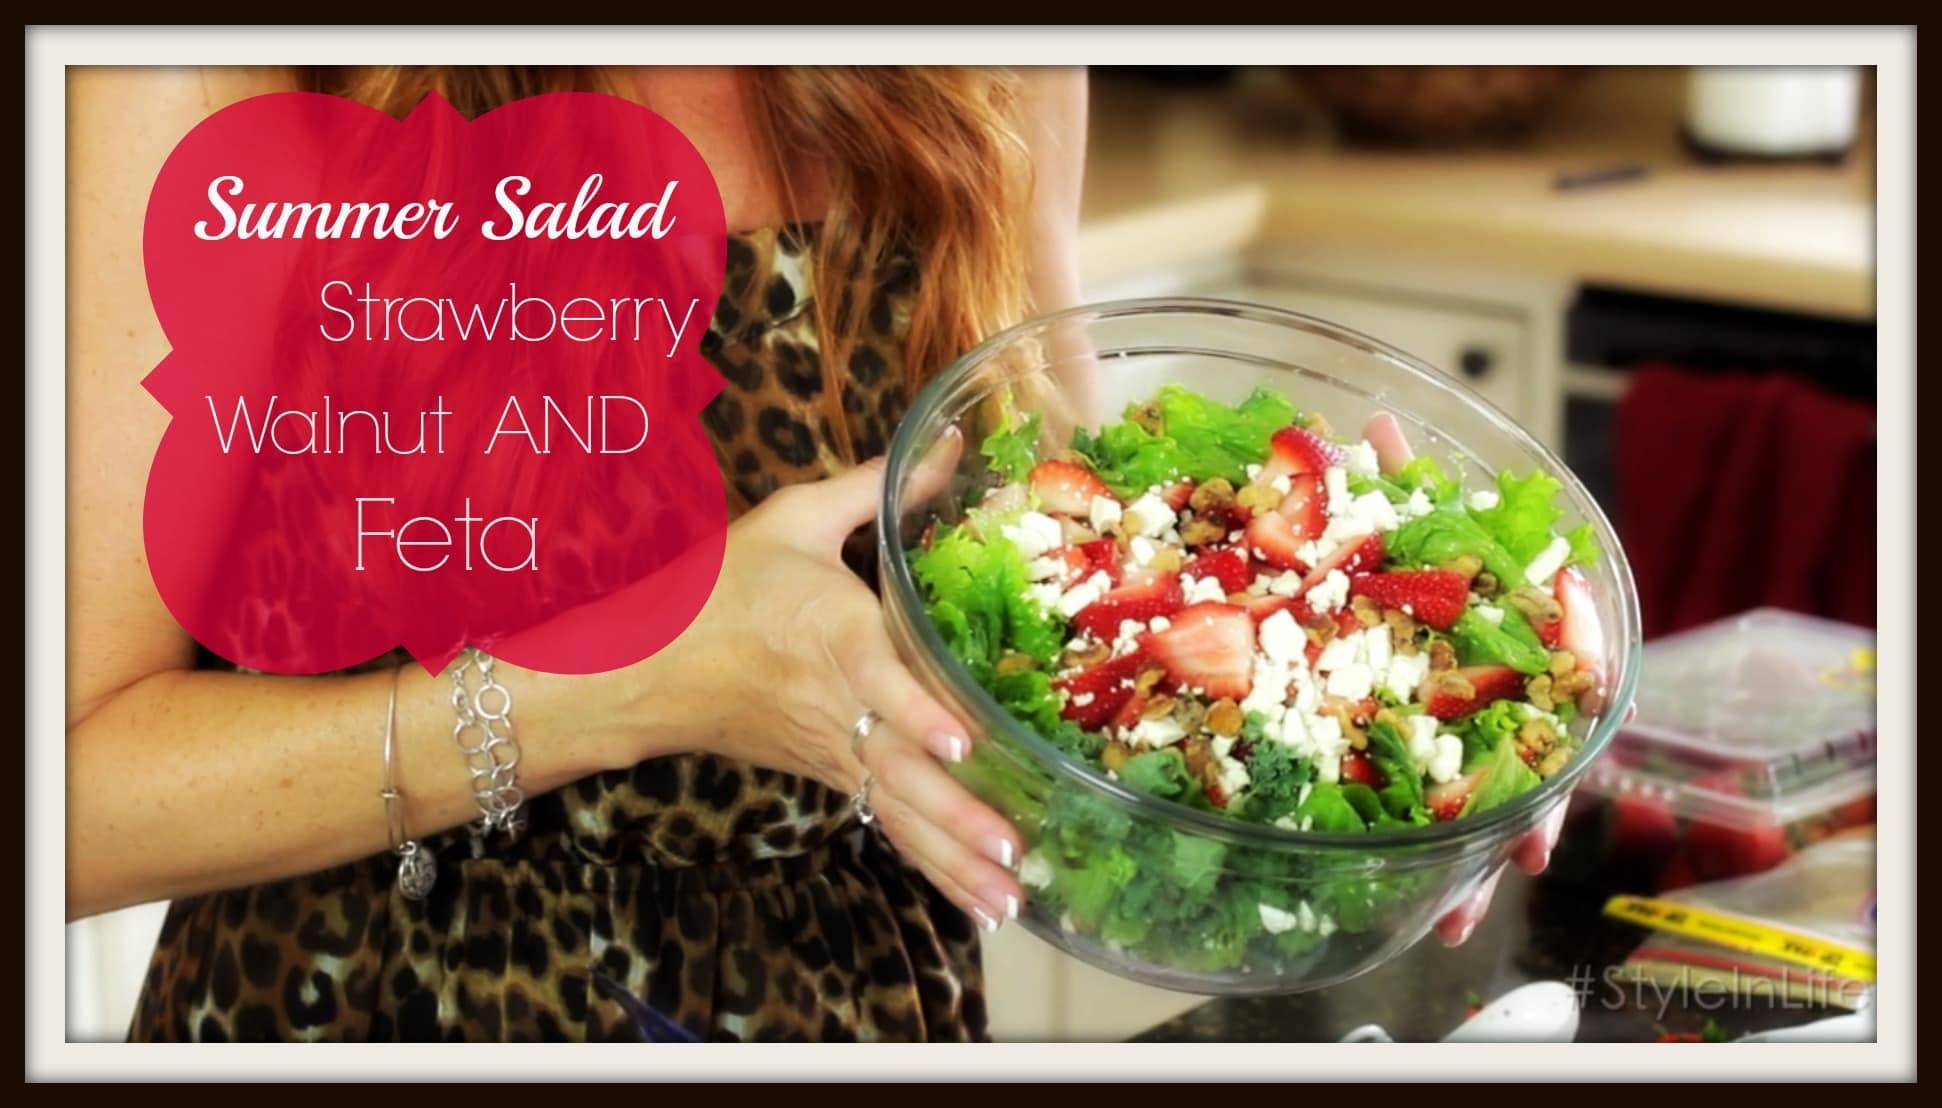 Summer Salad Recipe - Strawberry Walnut Feta Salad: Keeping Style in Your Life... ExtraordinaryMommy.com